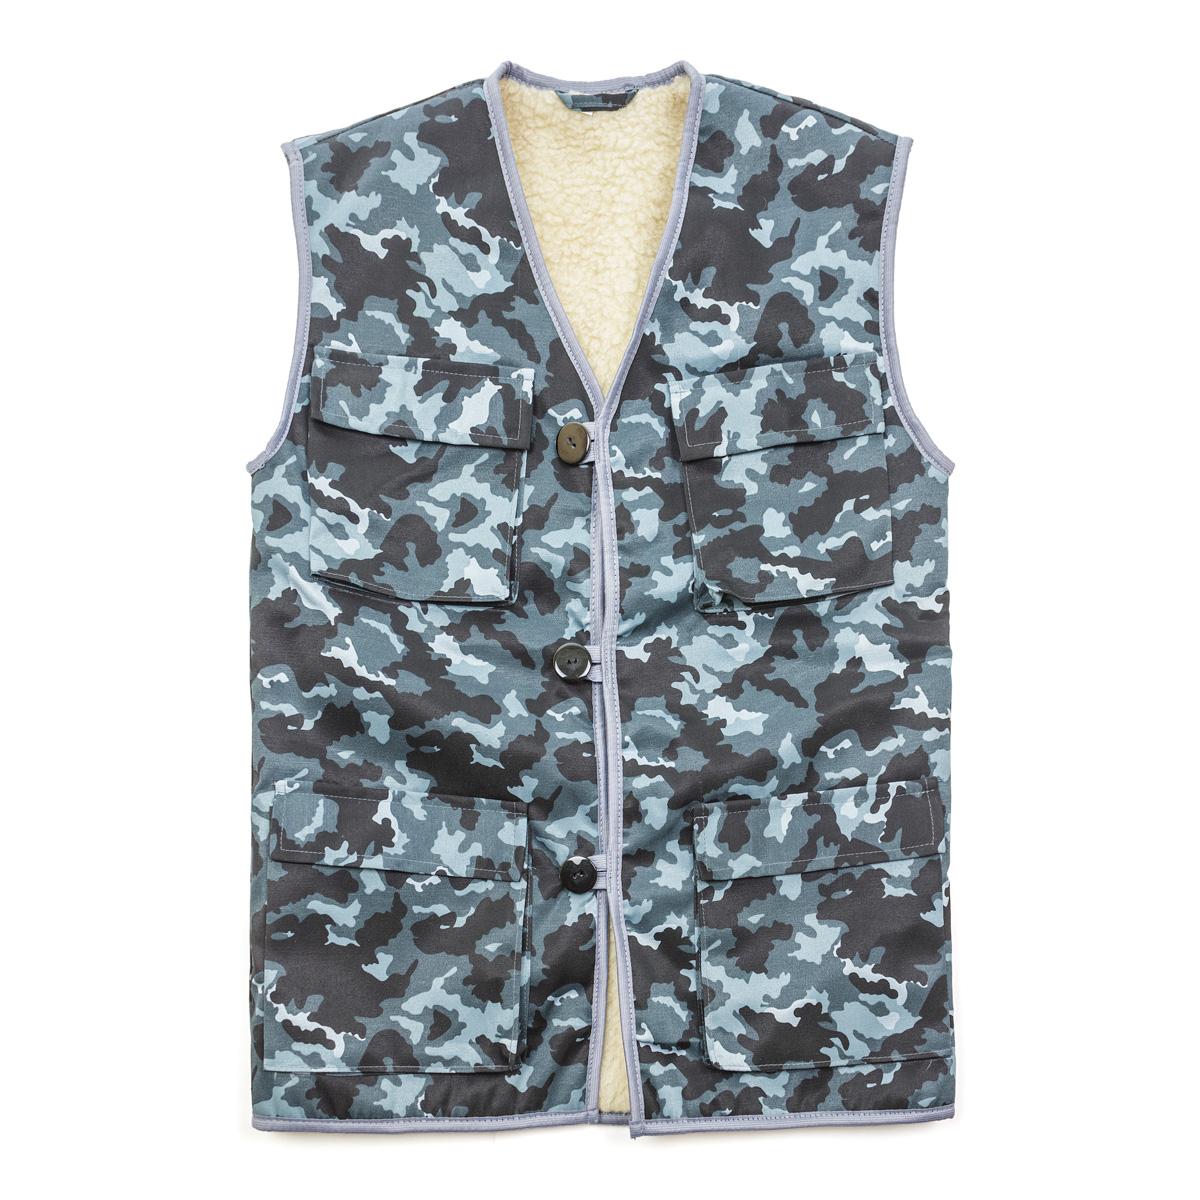 Муж. жилет арт. 13-0038 р. 60 - Текстиль для здоровья артикул: 21870